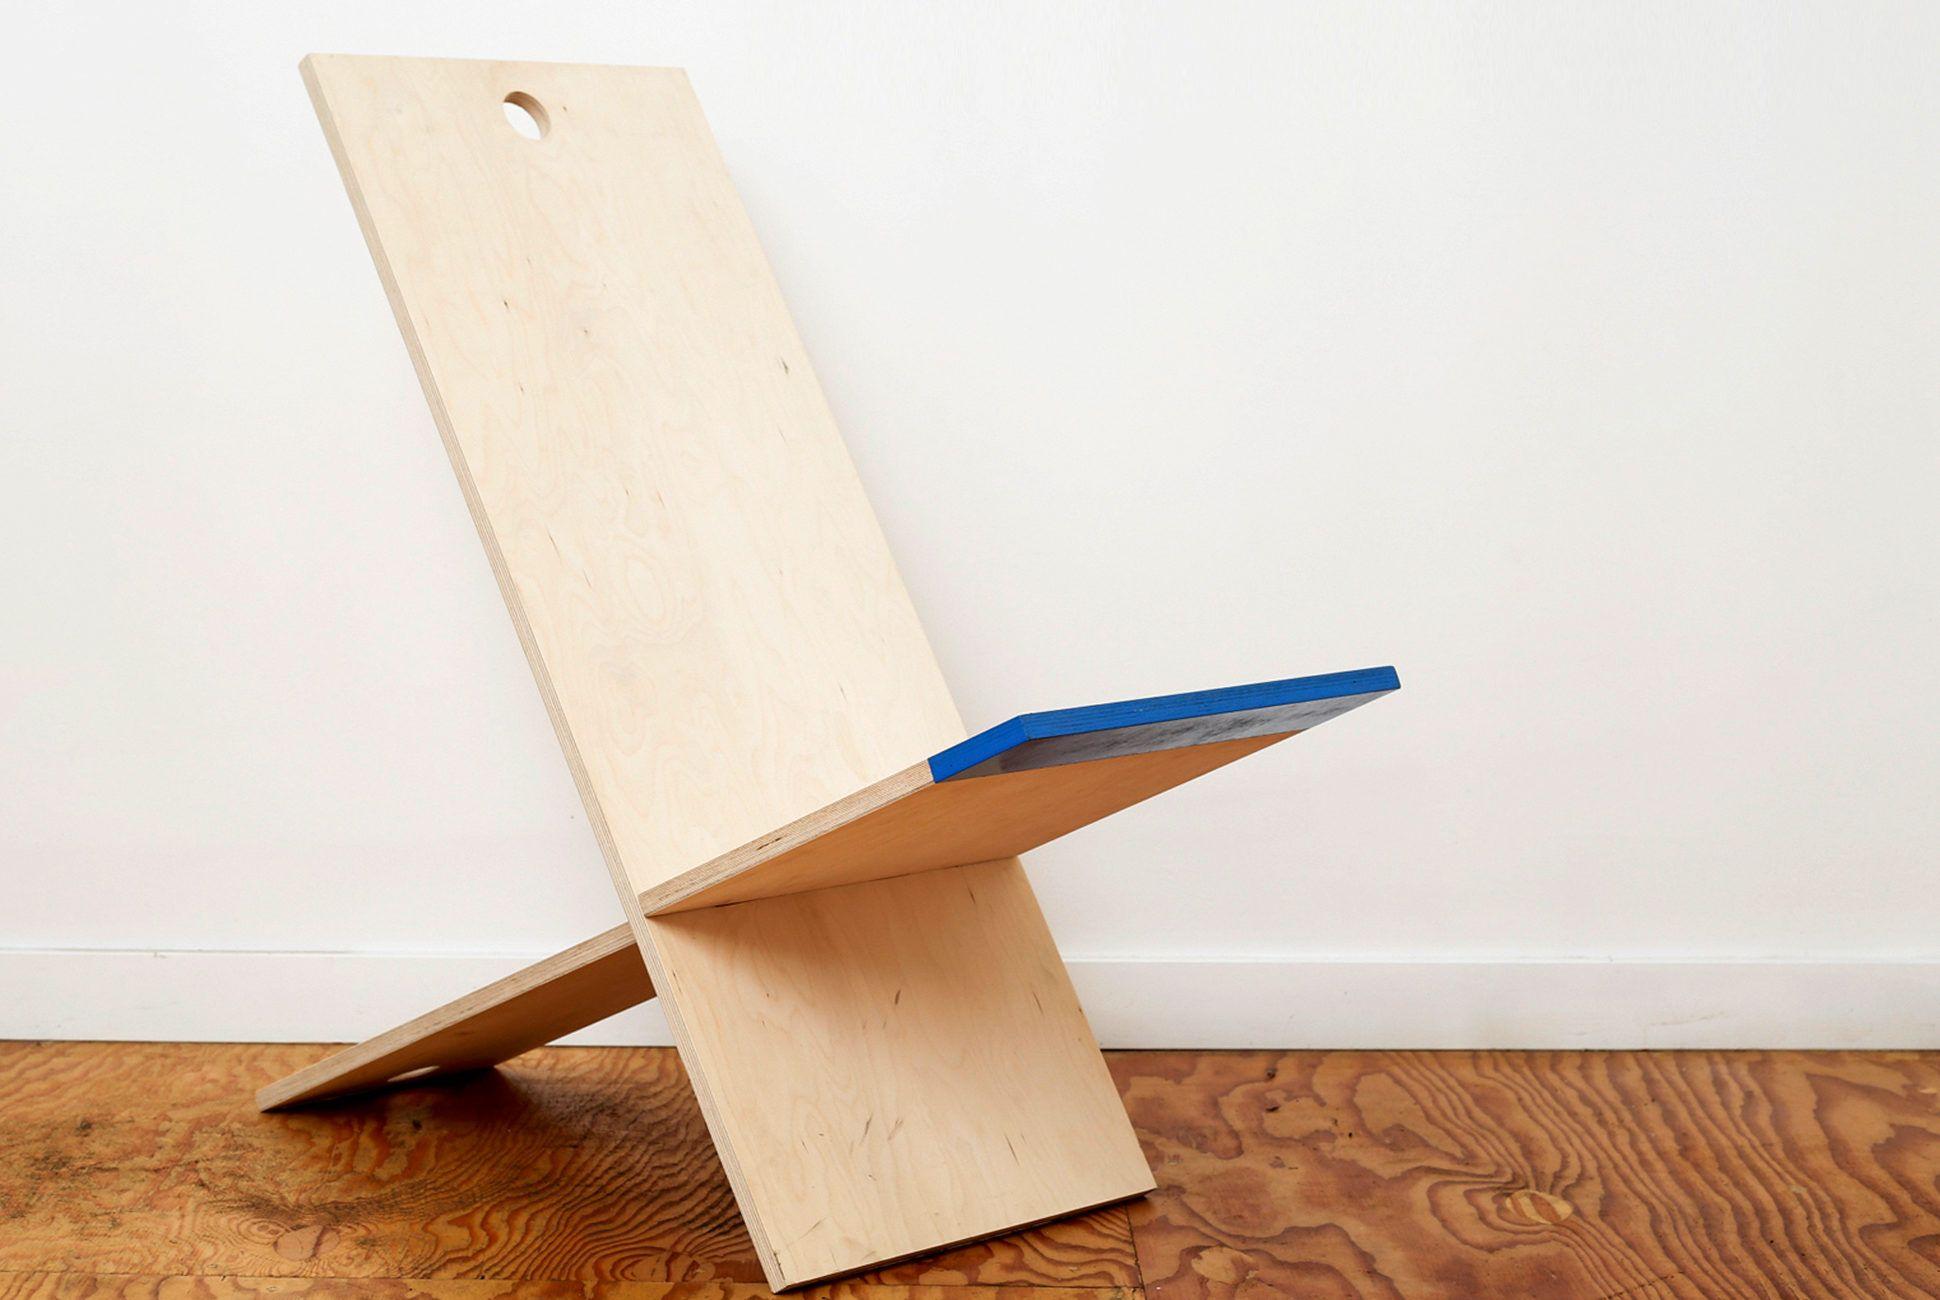 Marvelous New Made La Introduces Mid Century Inspired Housewares Creativecarmelina Interior Chair Design Creativecarmelinacom